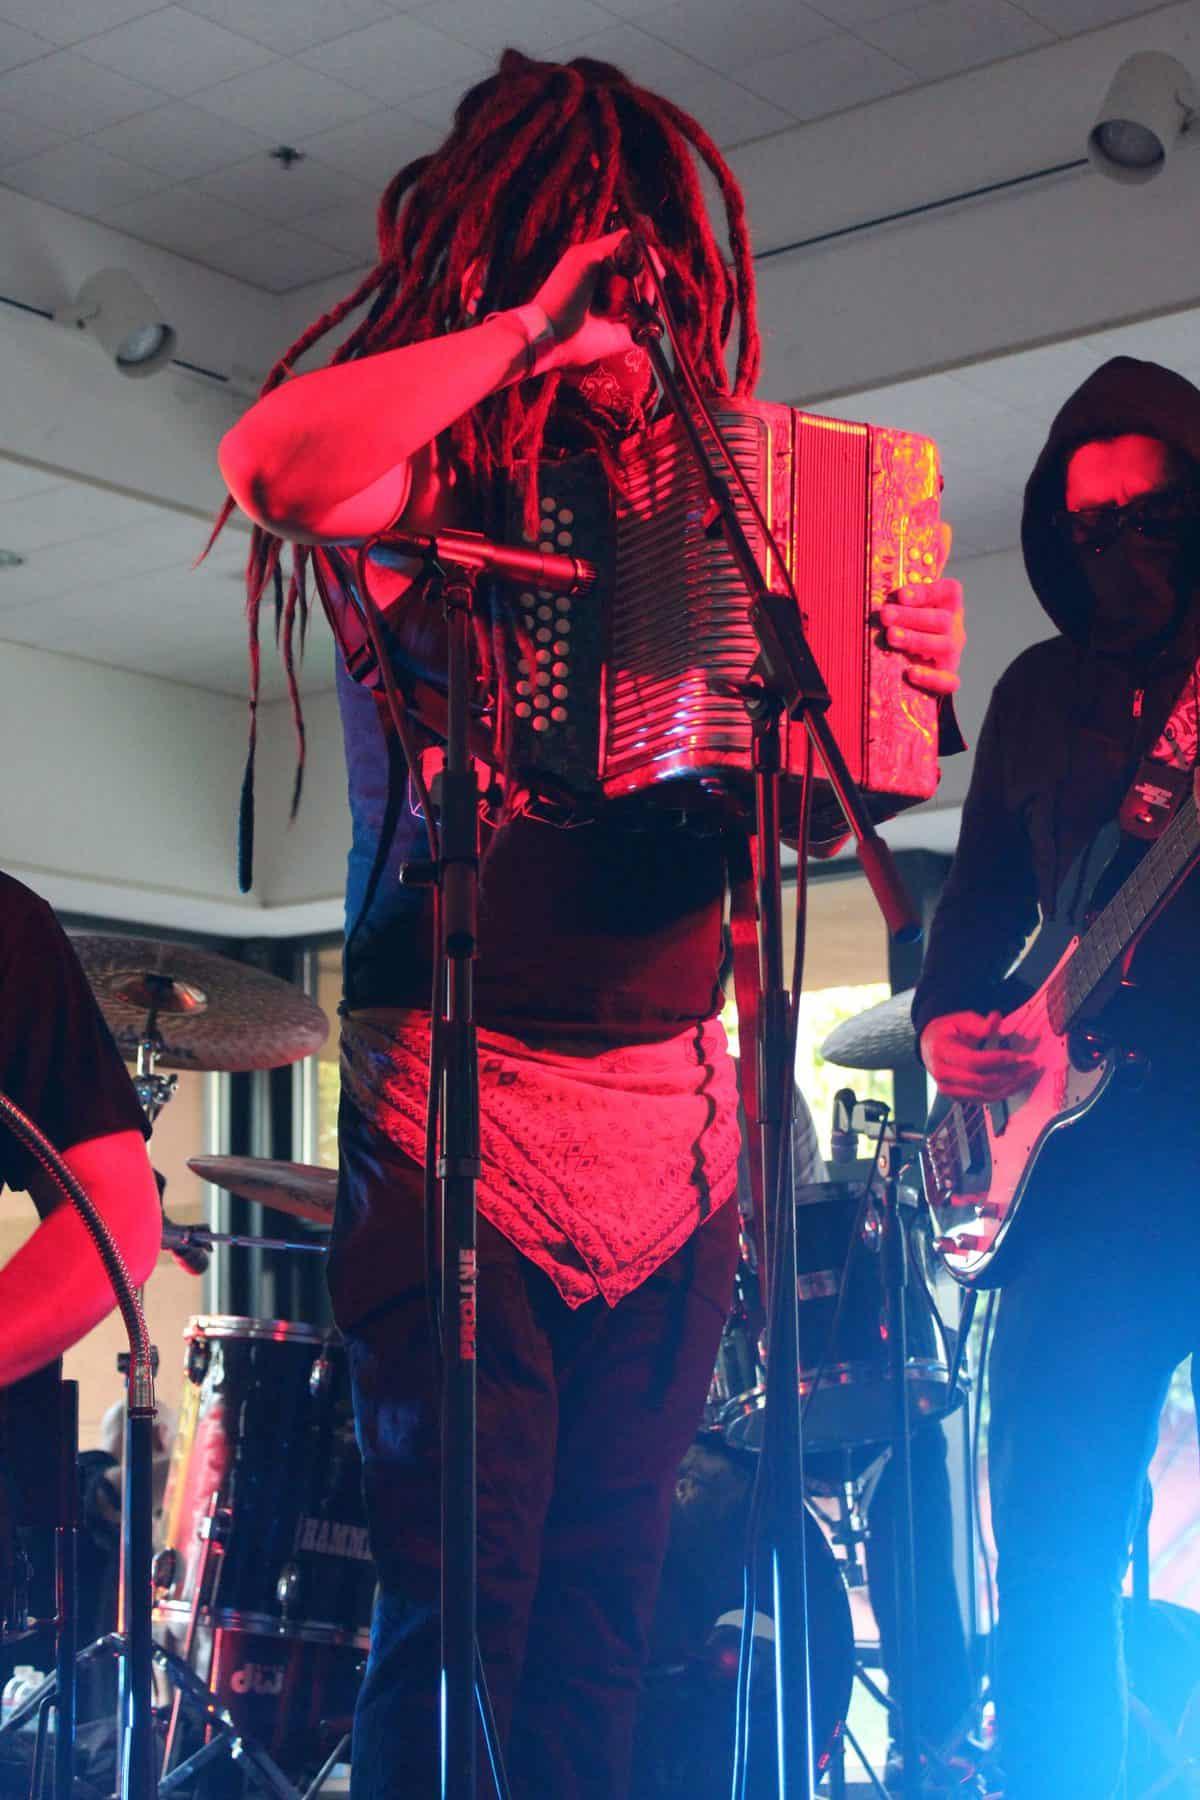 Medium shot of accordionist on stage